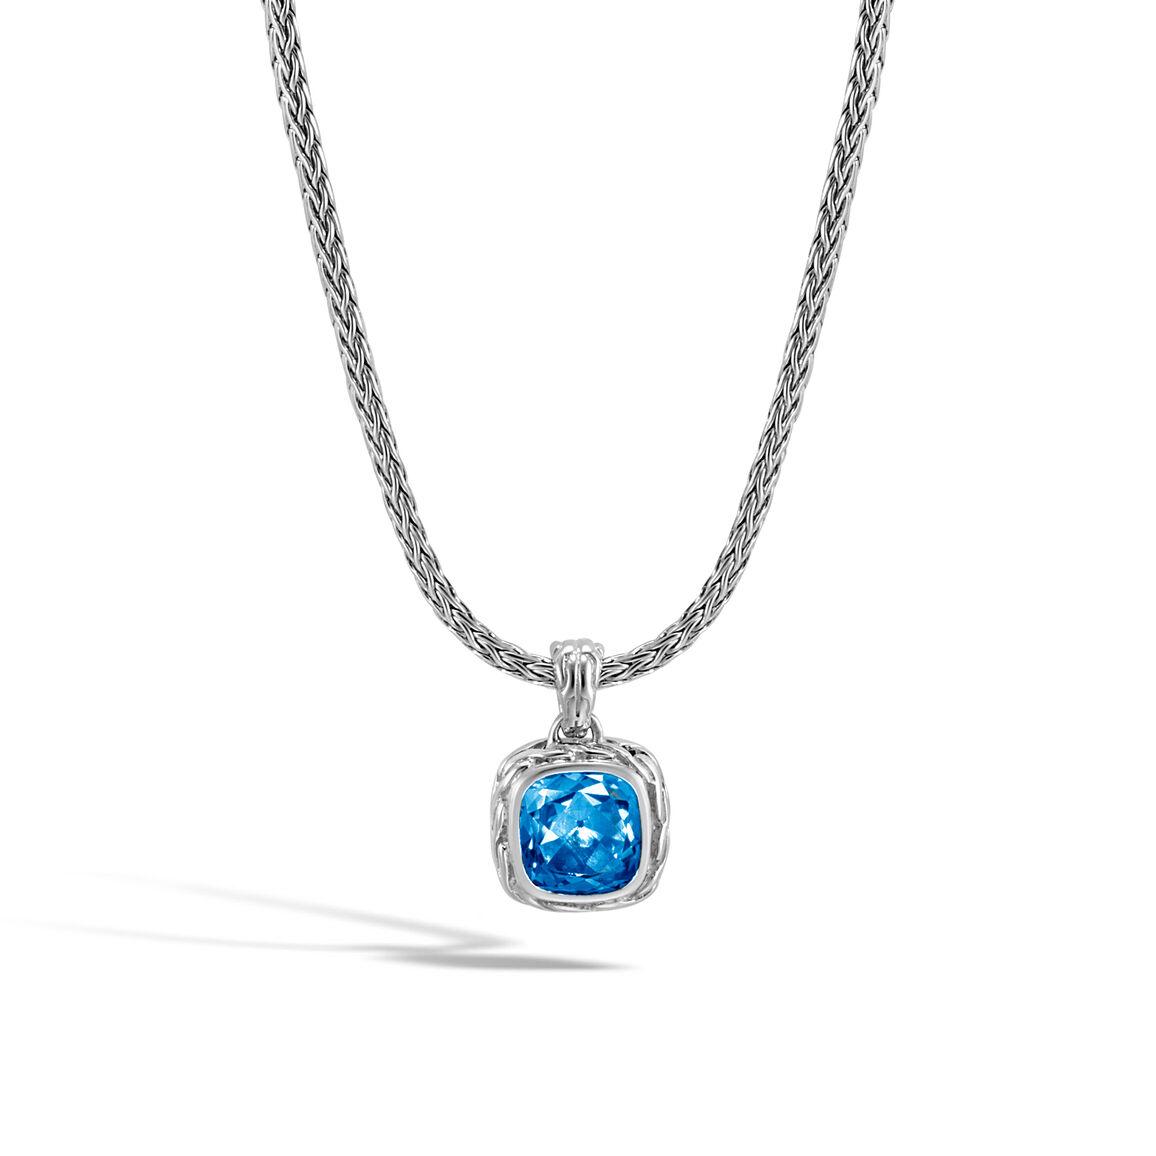 Classic Chain Magic Cut Pendant Necklace, Silver, 8MM Gem